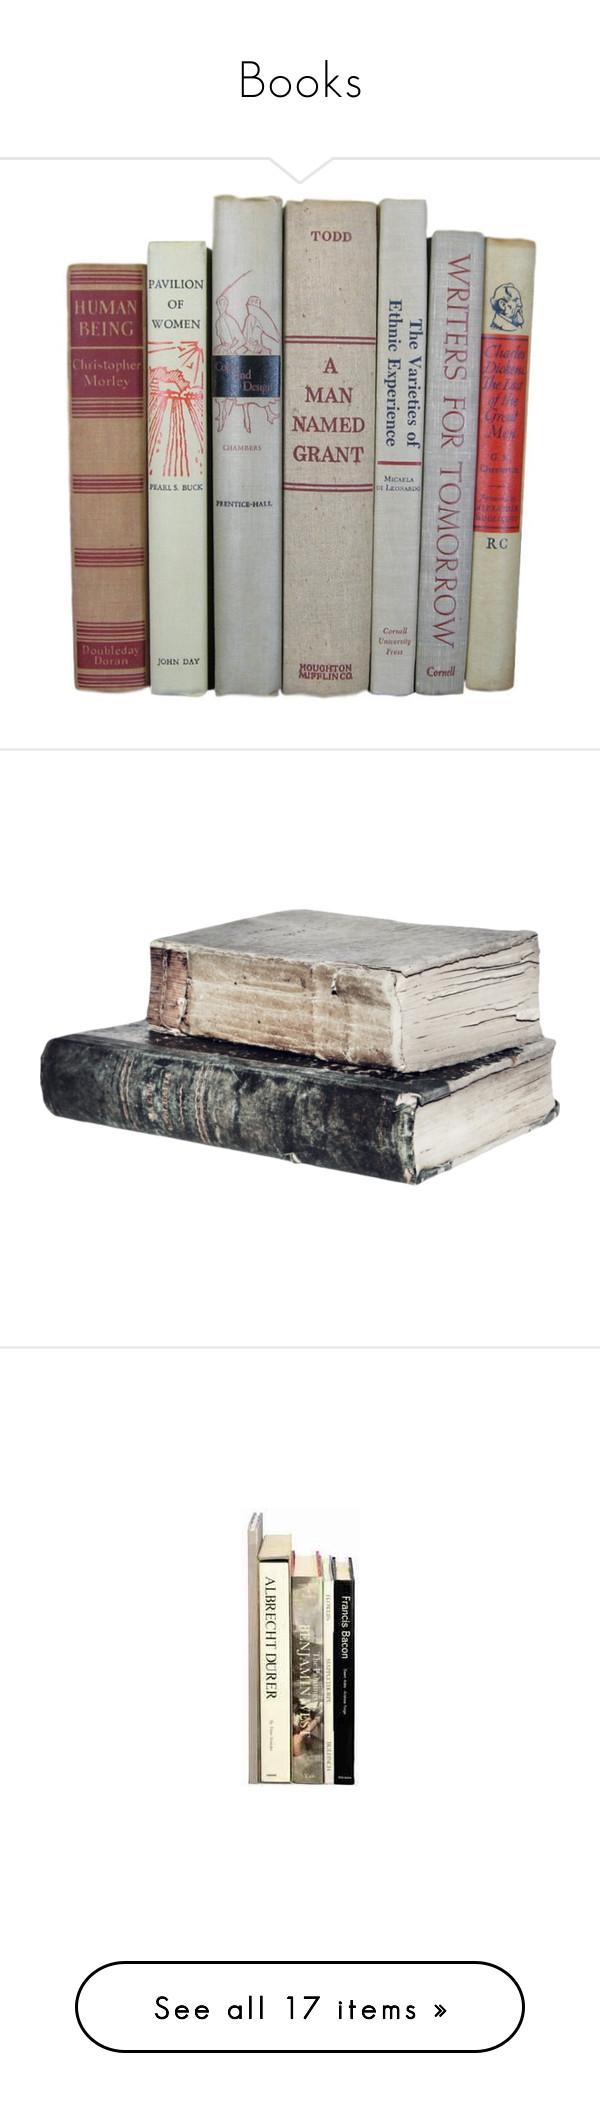 Books\